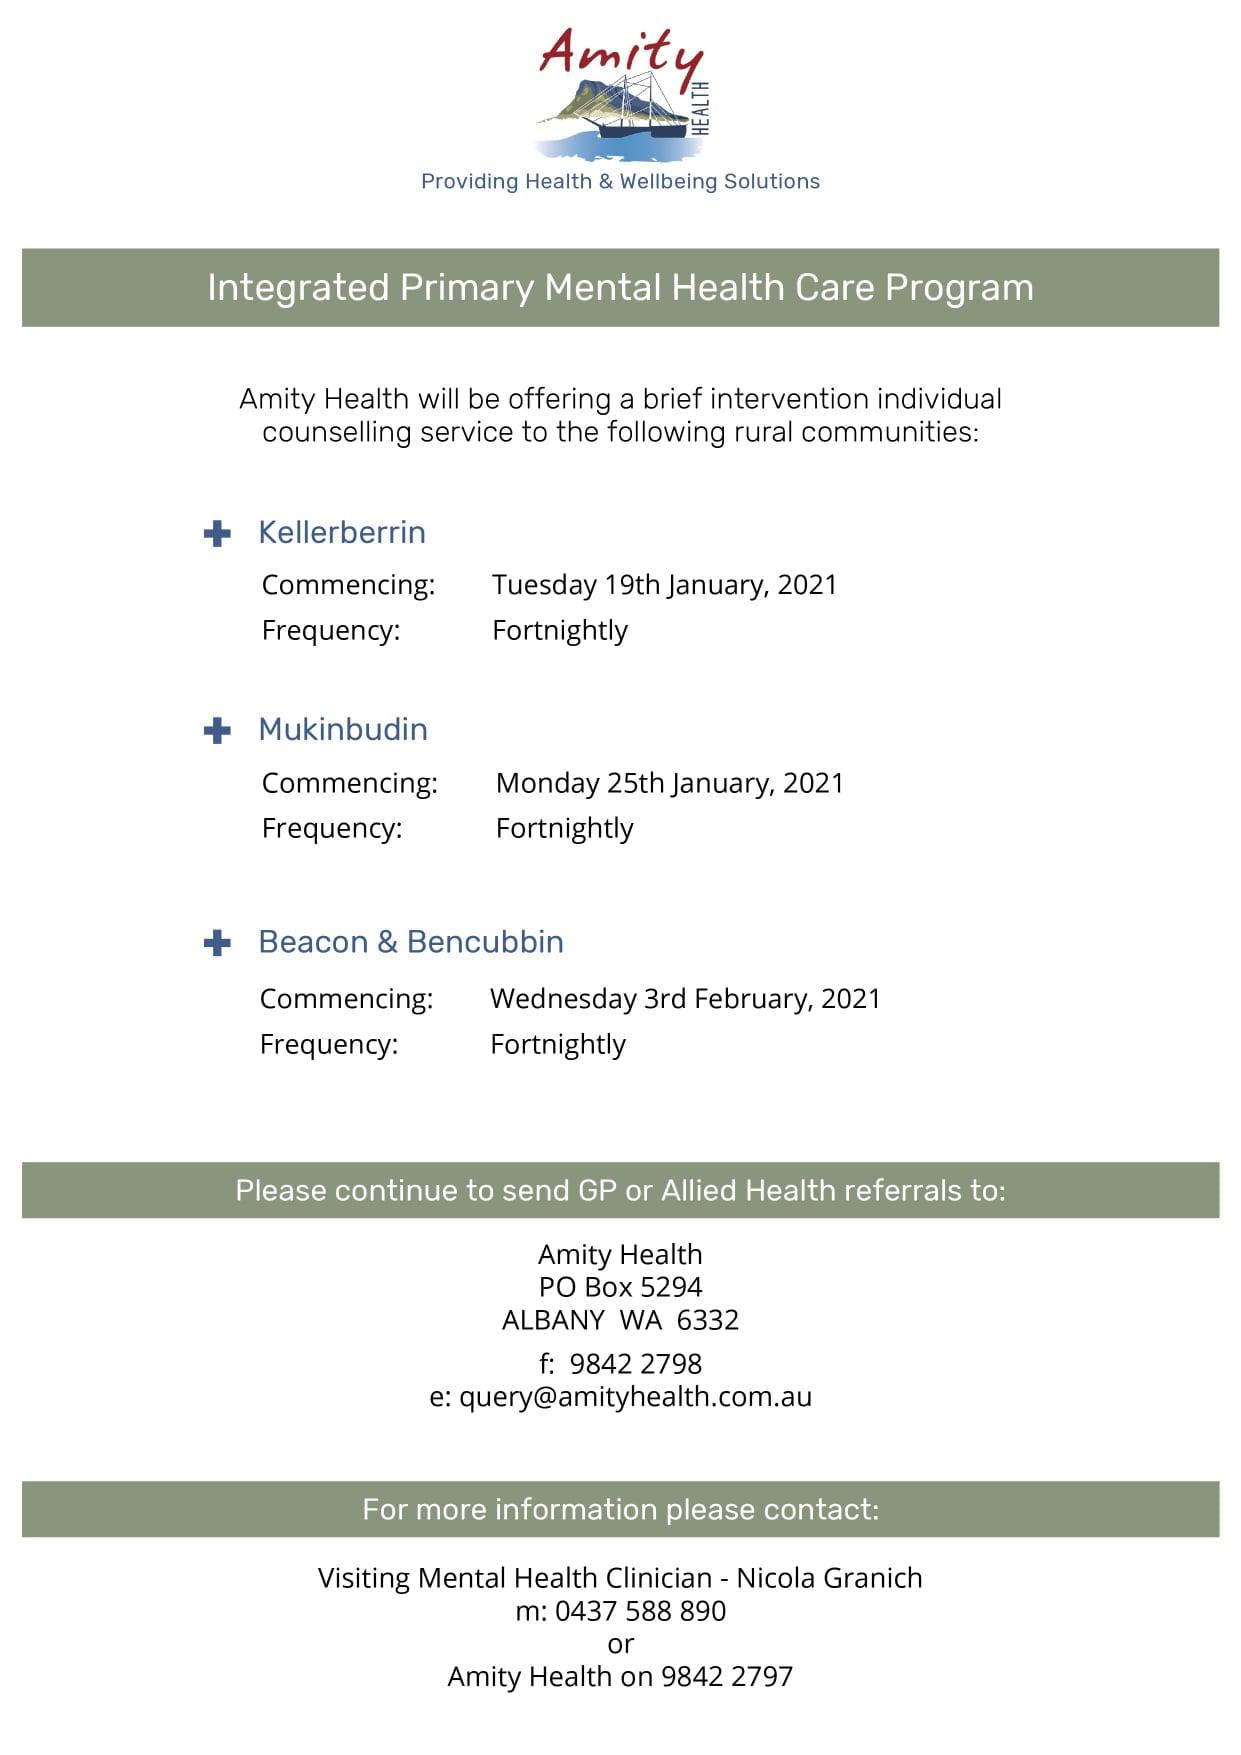 Amity-Mental Health Clinician